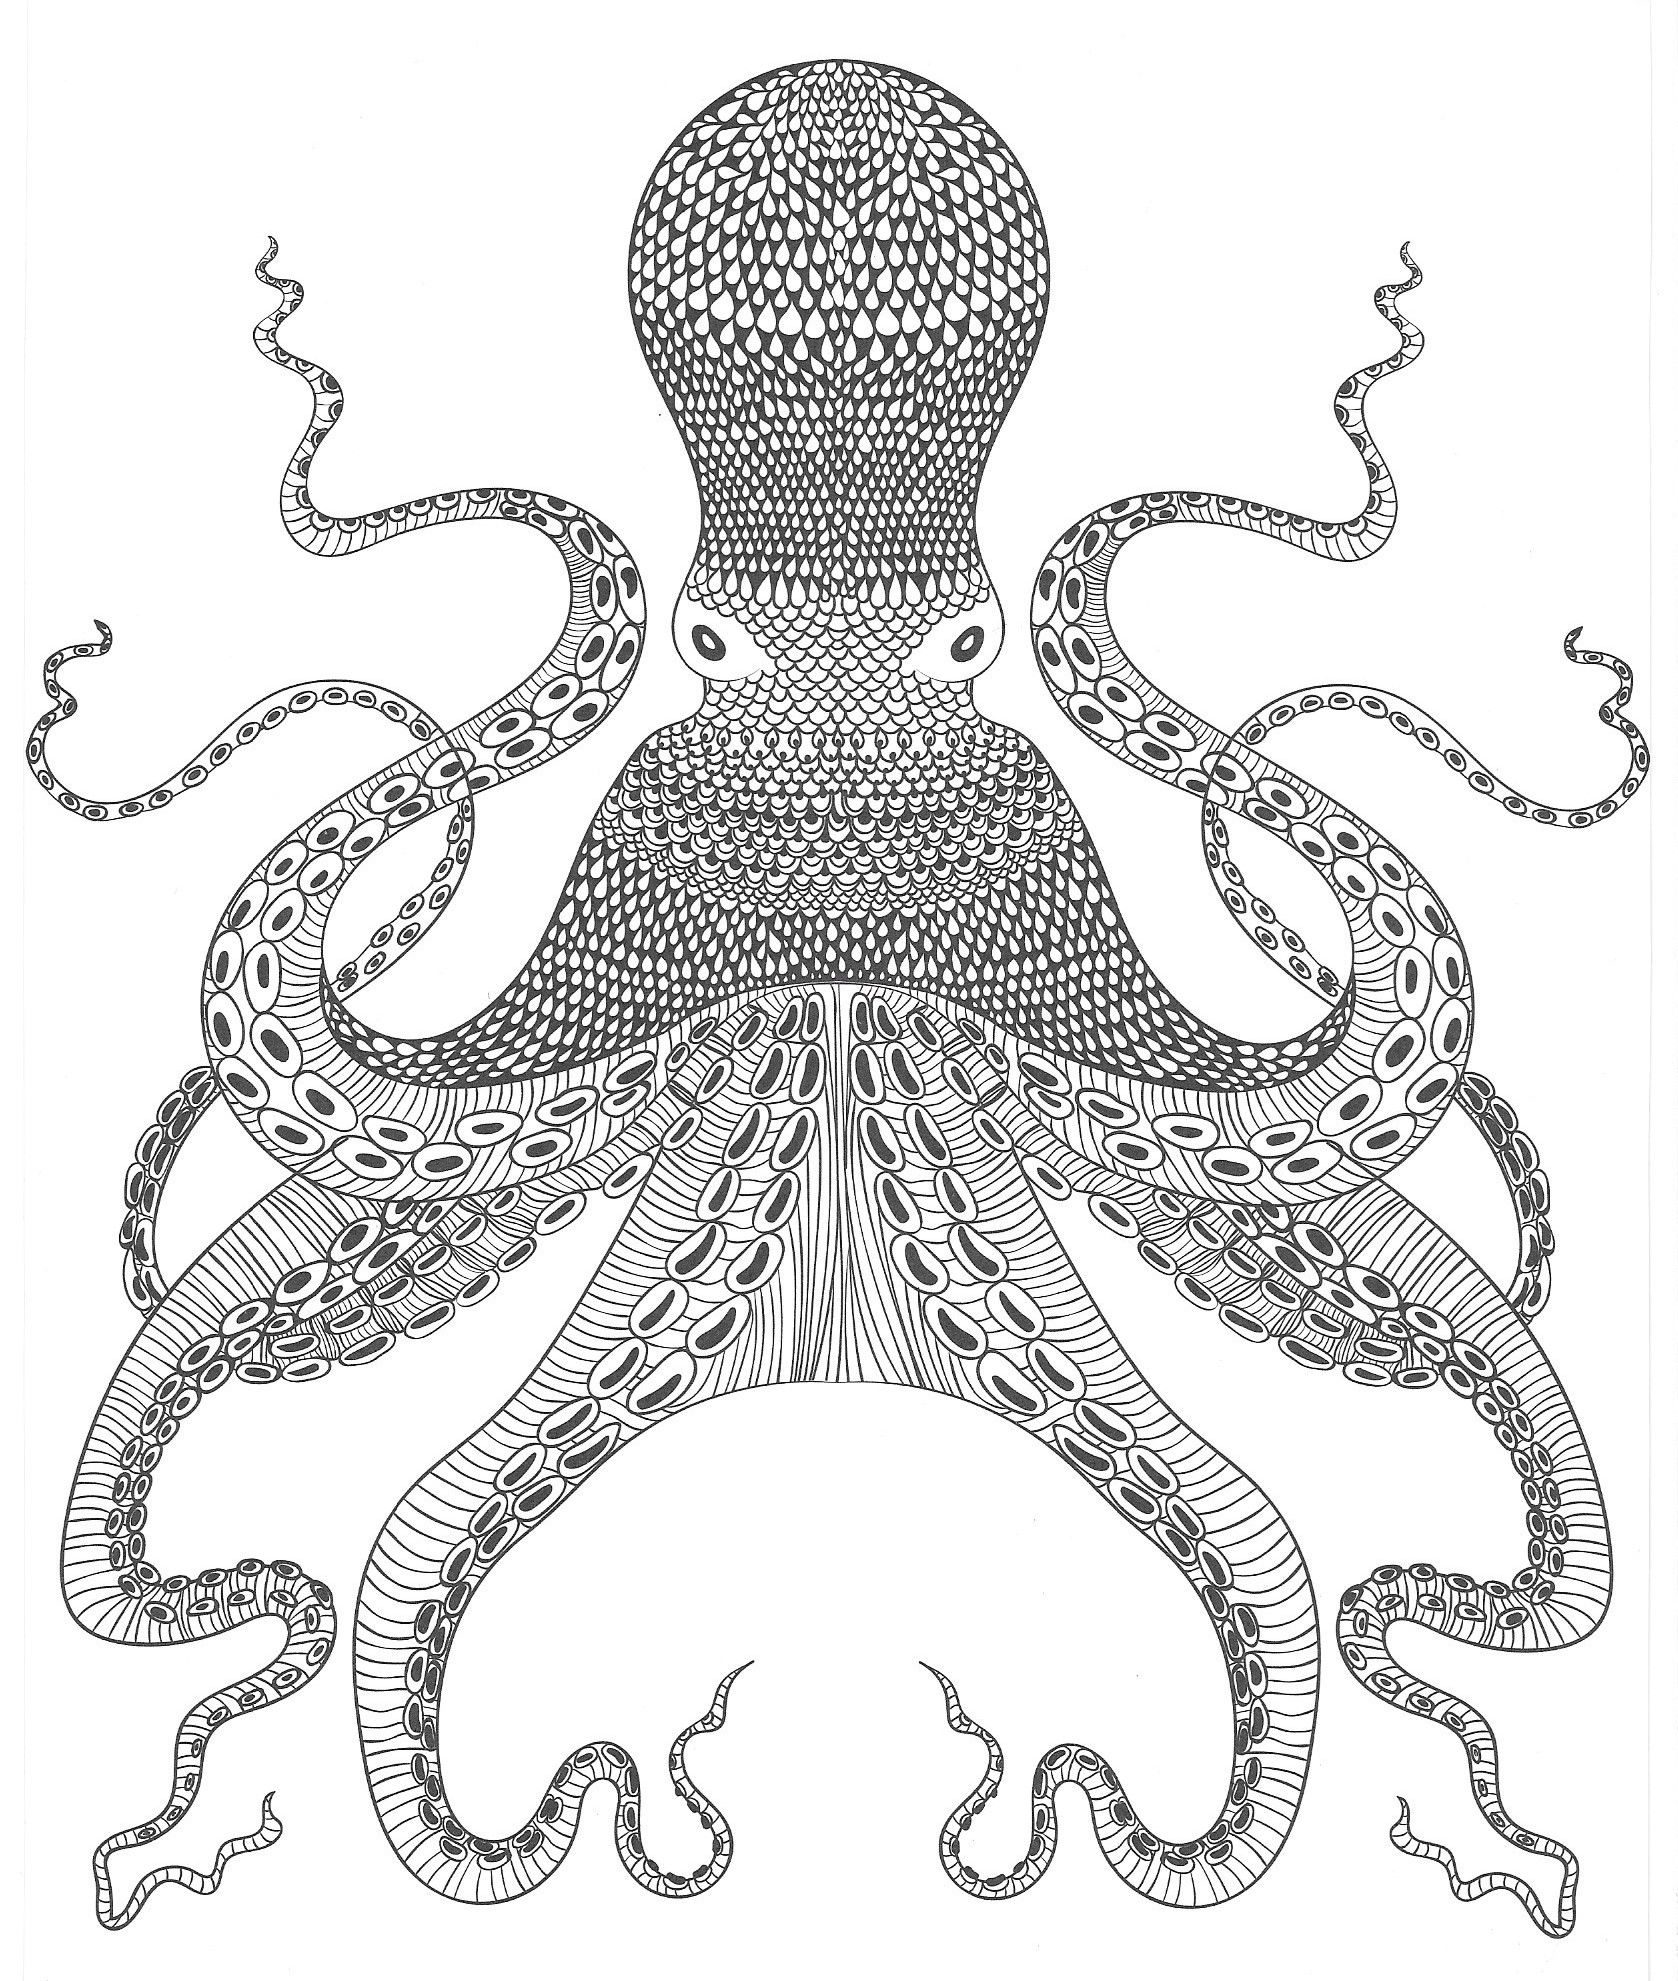 Krake Oktopus | Malvorlagen - Coloring Pages | Pinterest | Oktopus ...